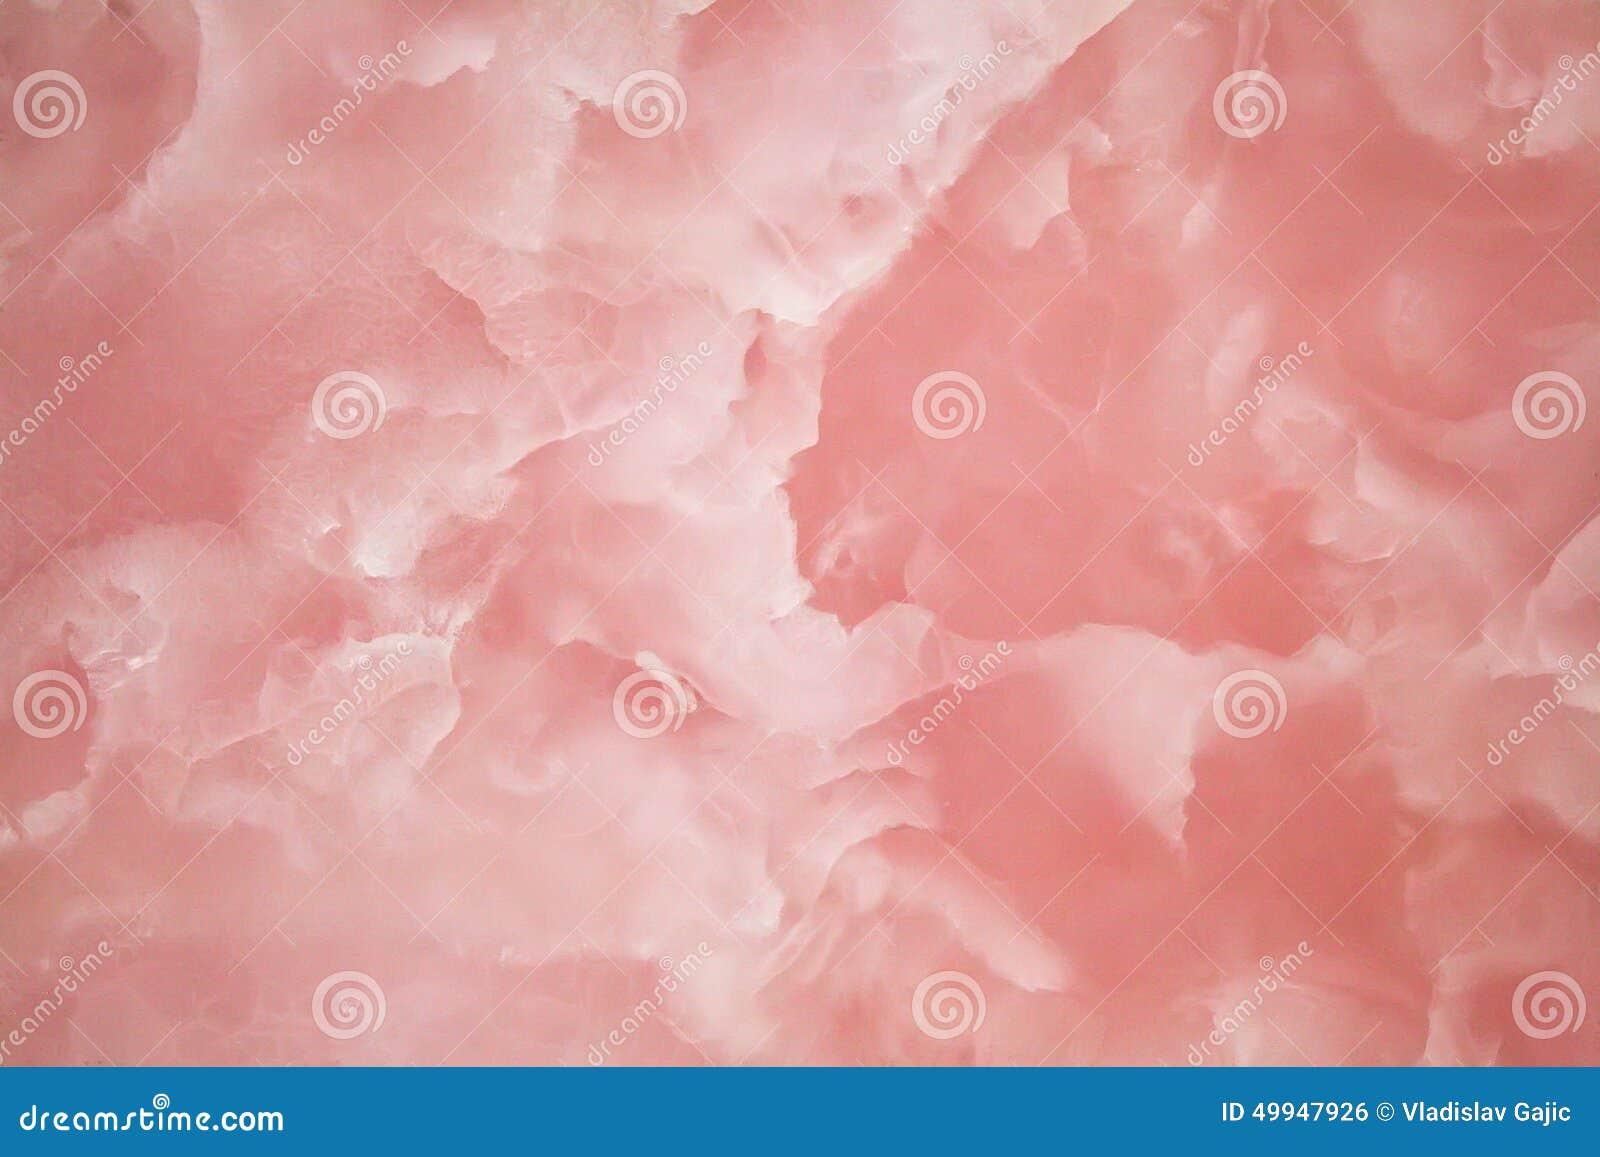 red stone background stock photo image 49947926